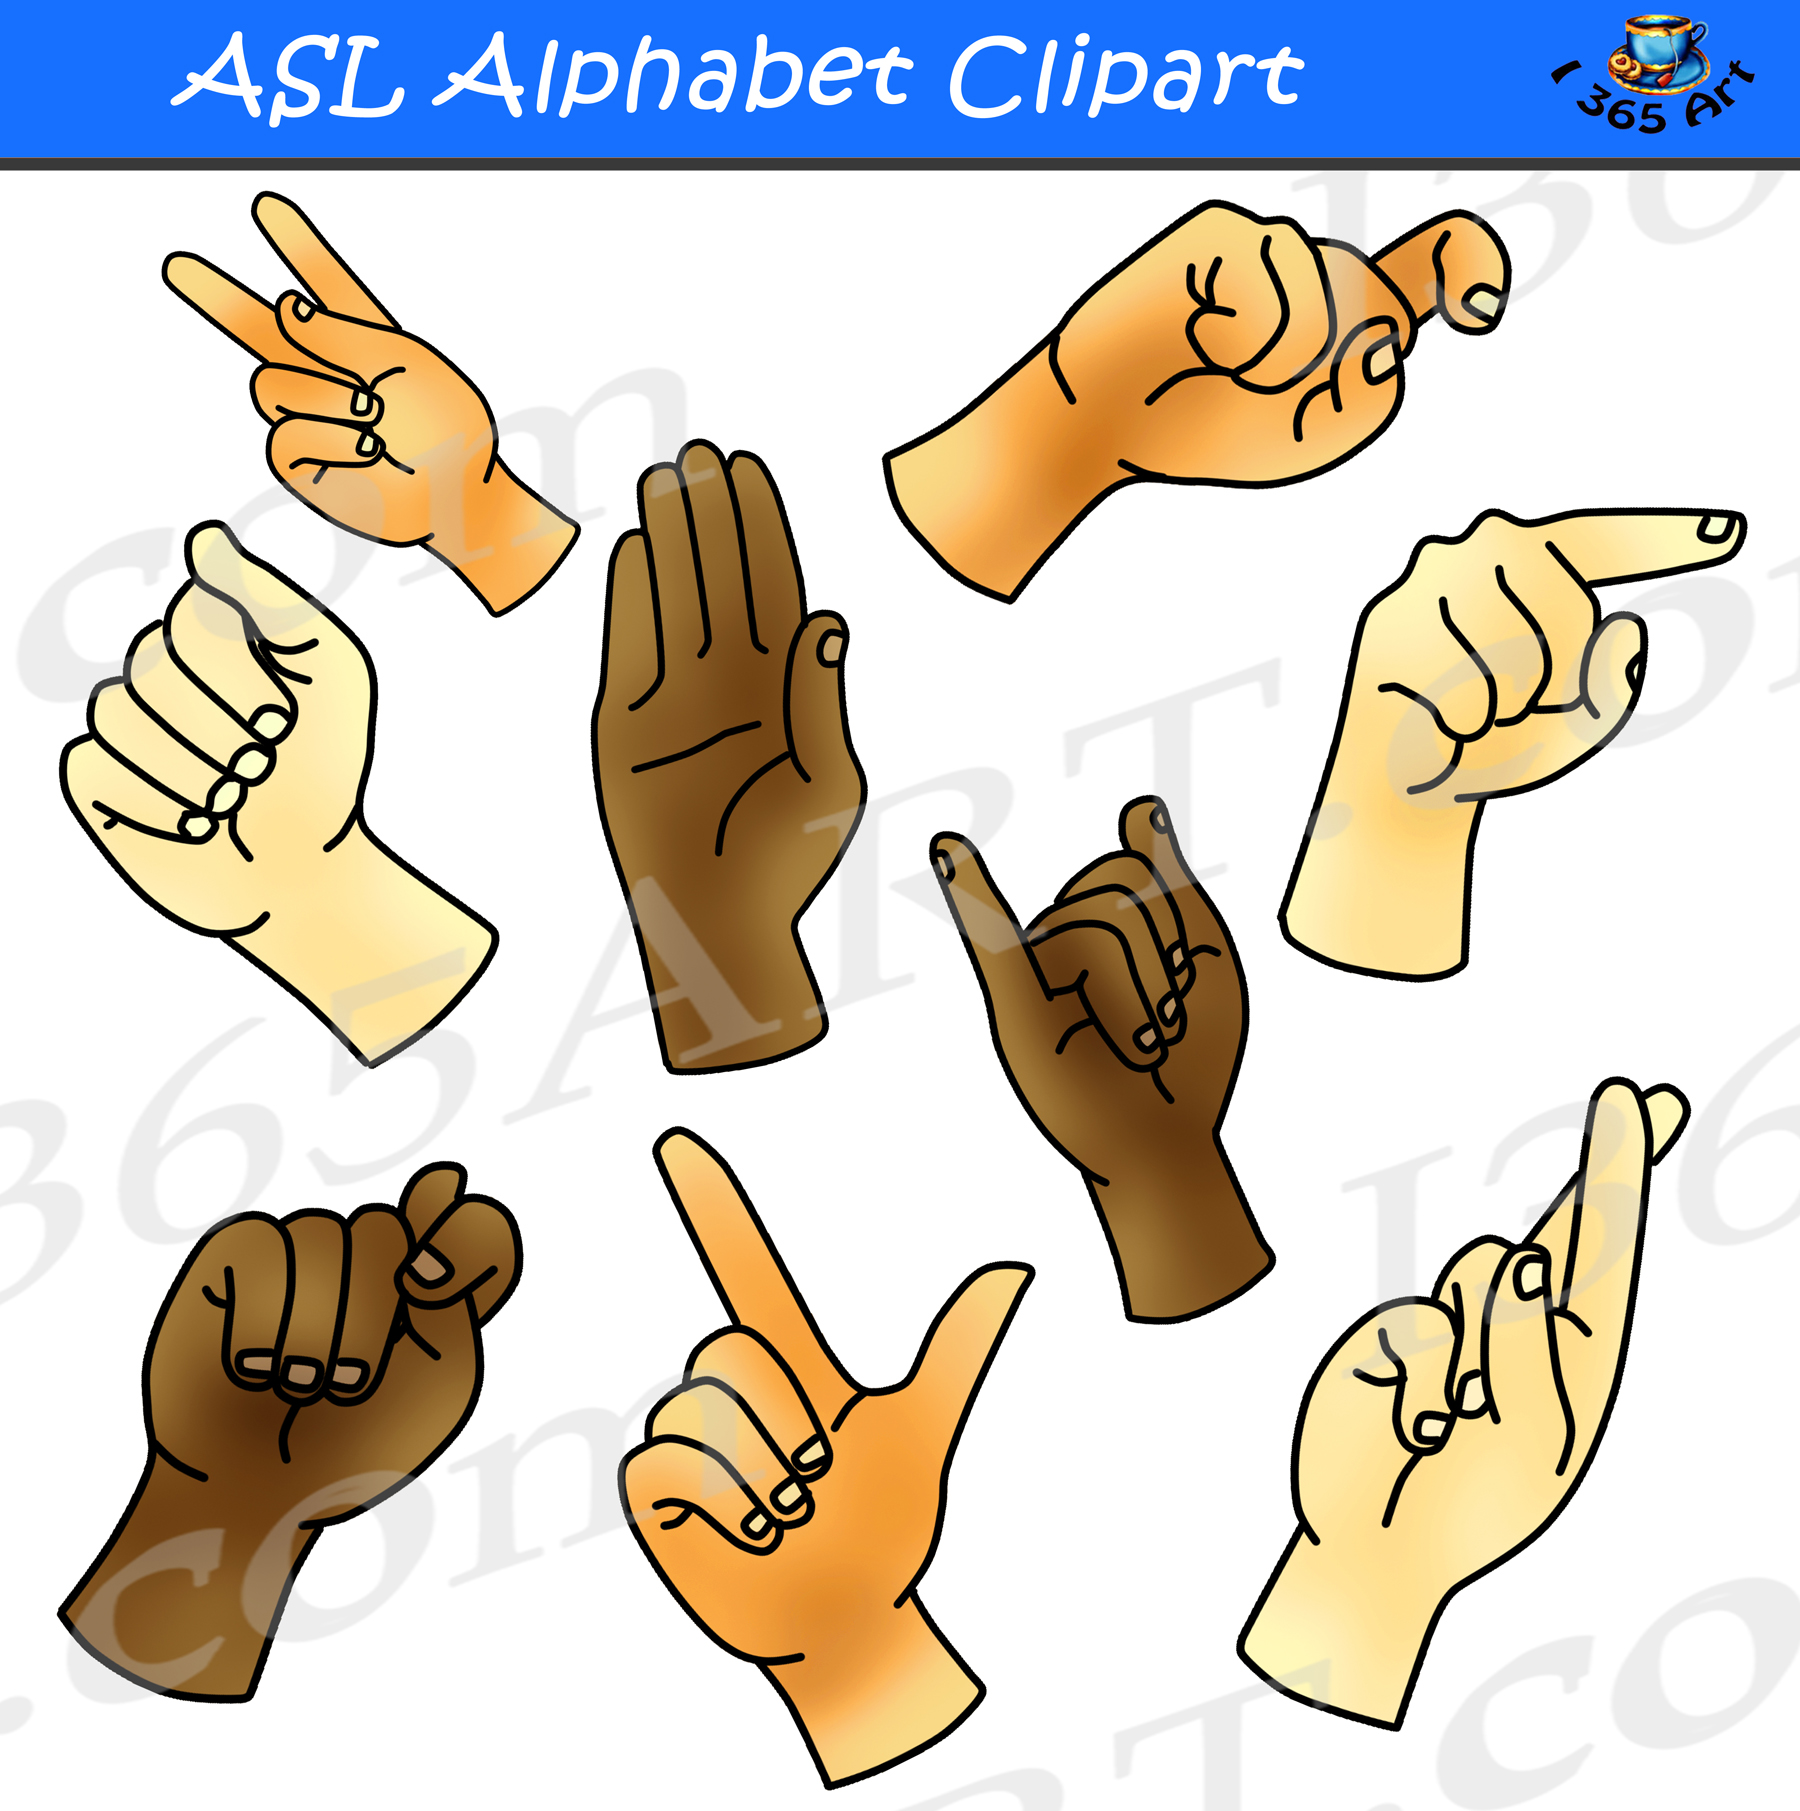 Asl clipart stock ASL Alphabet Clipart Bundle Pack stock